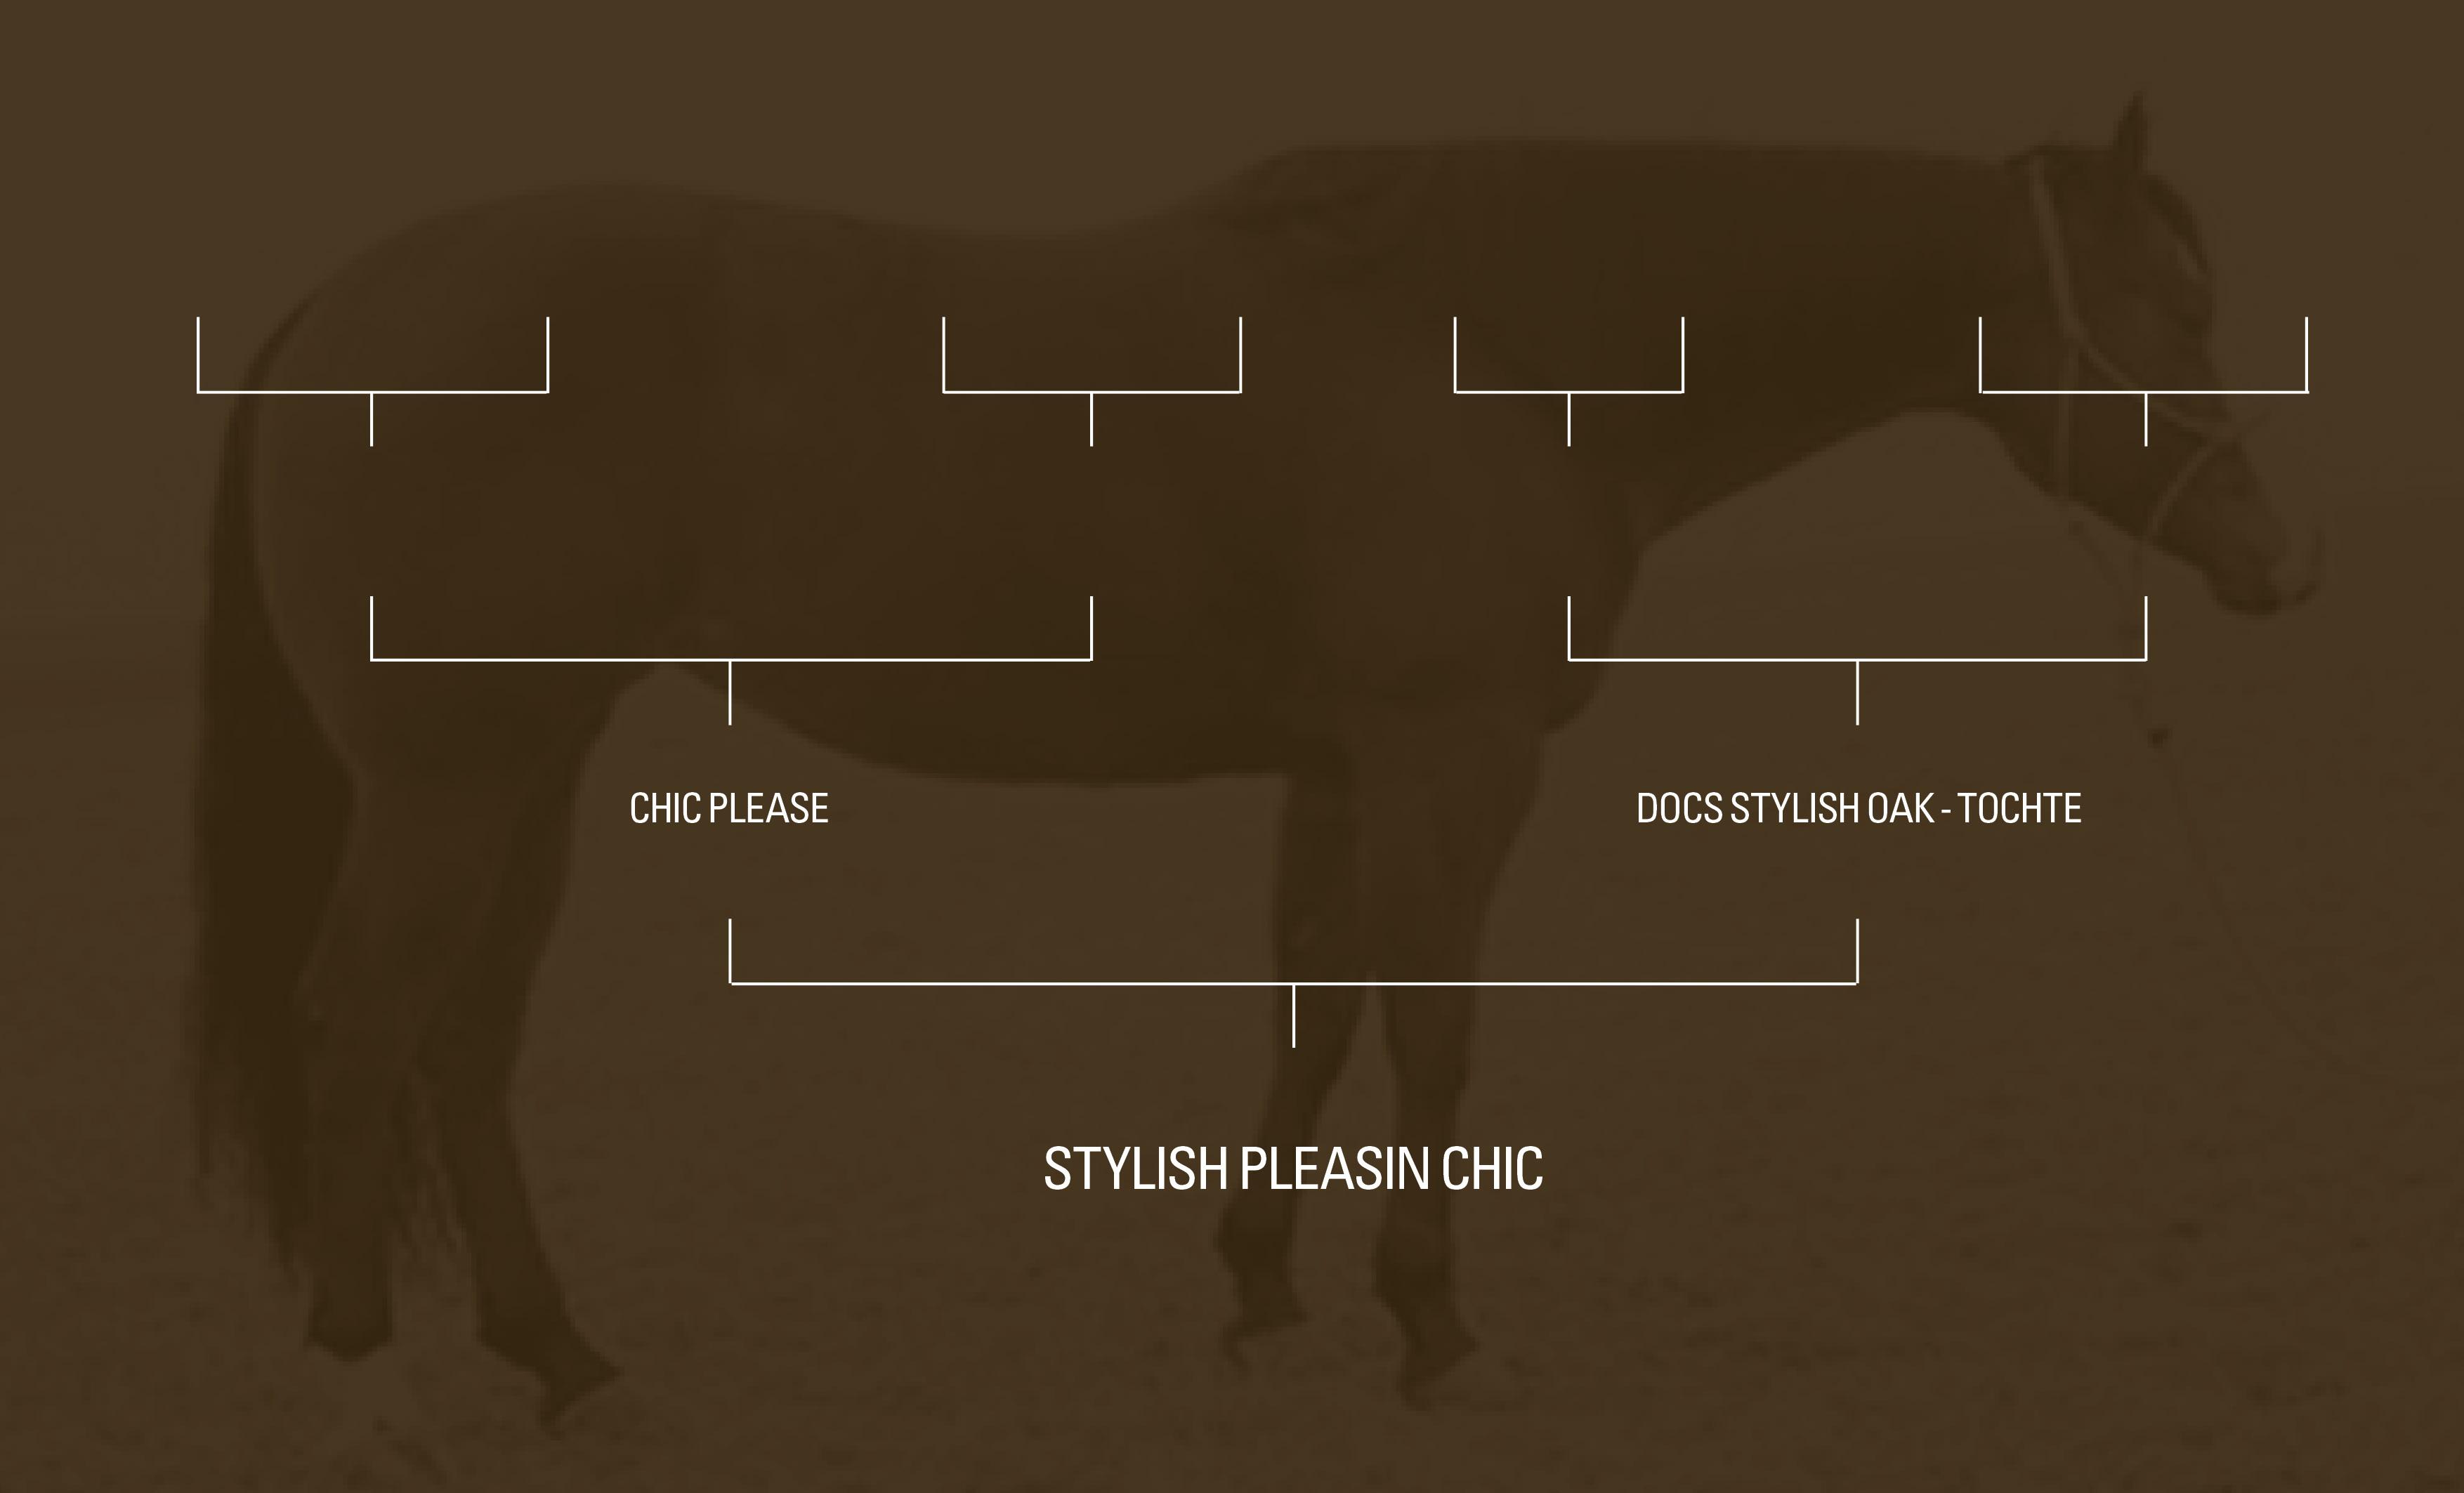 Stammbaum-Stylish-Pleasin-Chic-07-2018